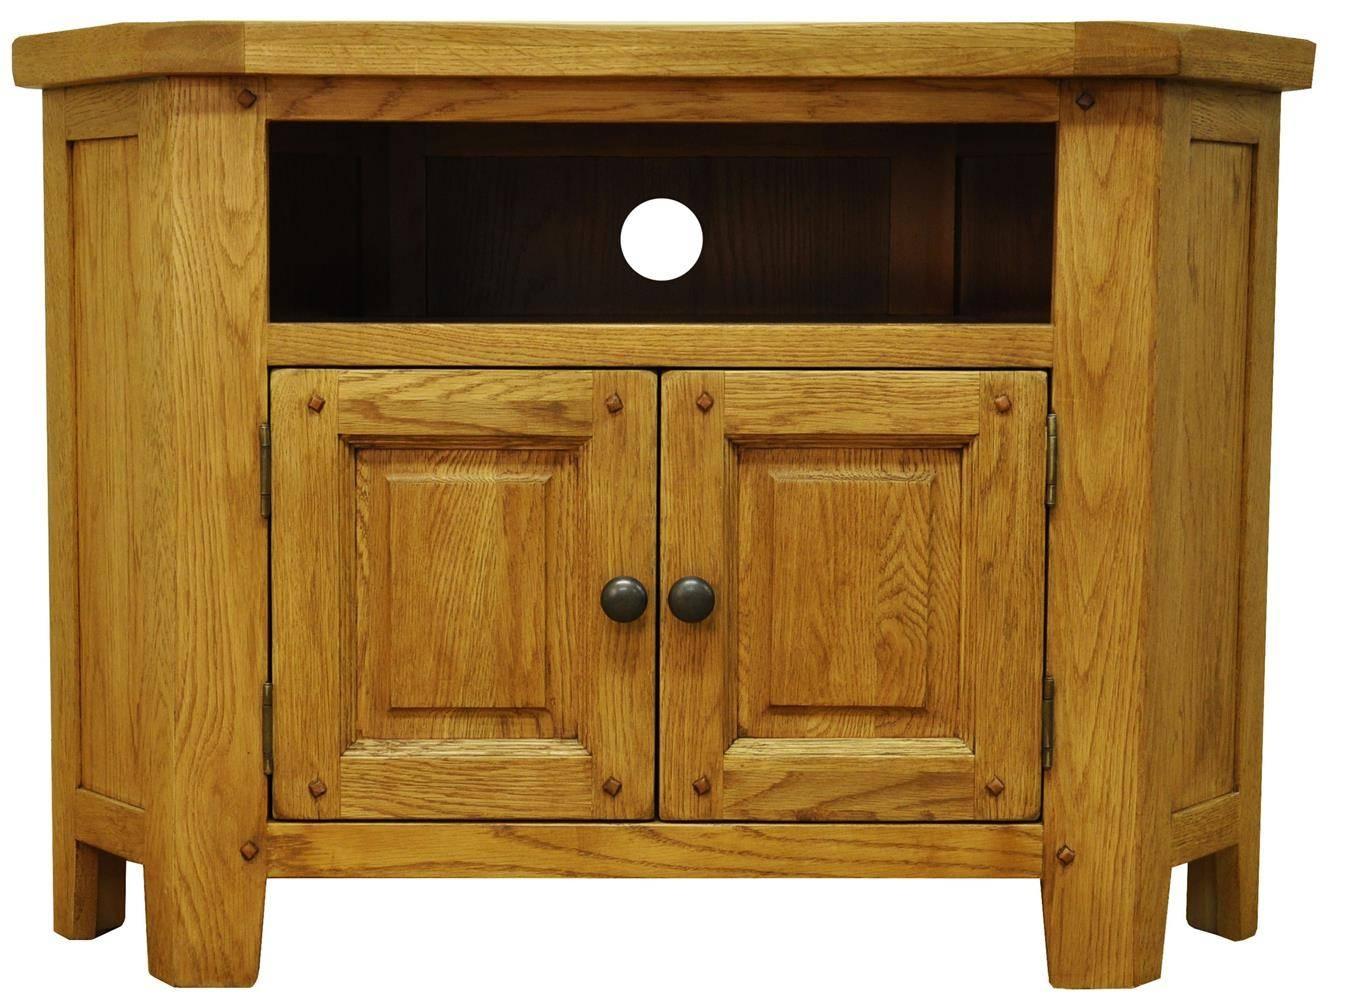 Tv Cabinets : Stanton Rustic Oak Corner Tv Unitstanton Rustic Oak within Rustic Oak Tv Stands (Image 15 of 15)